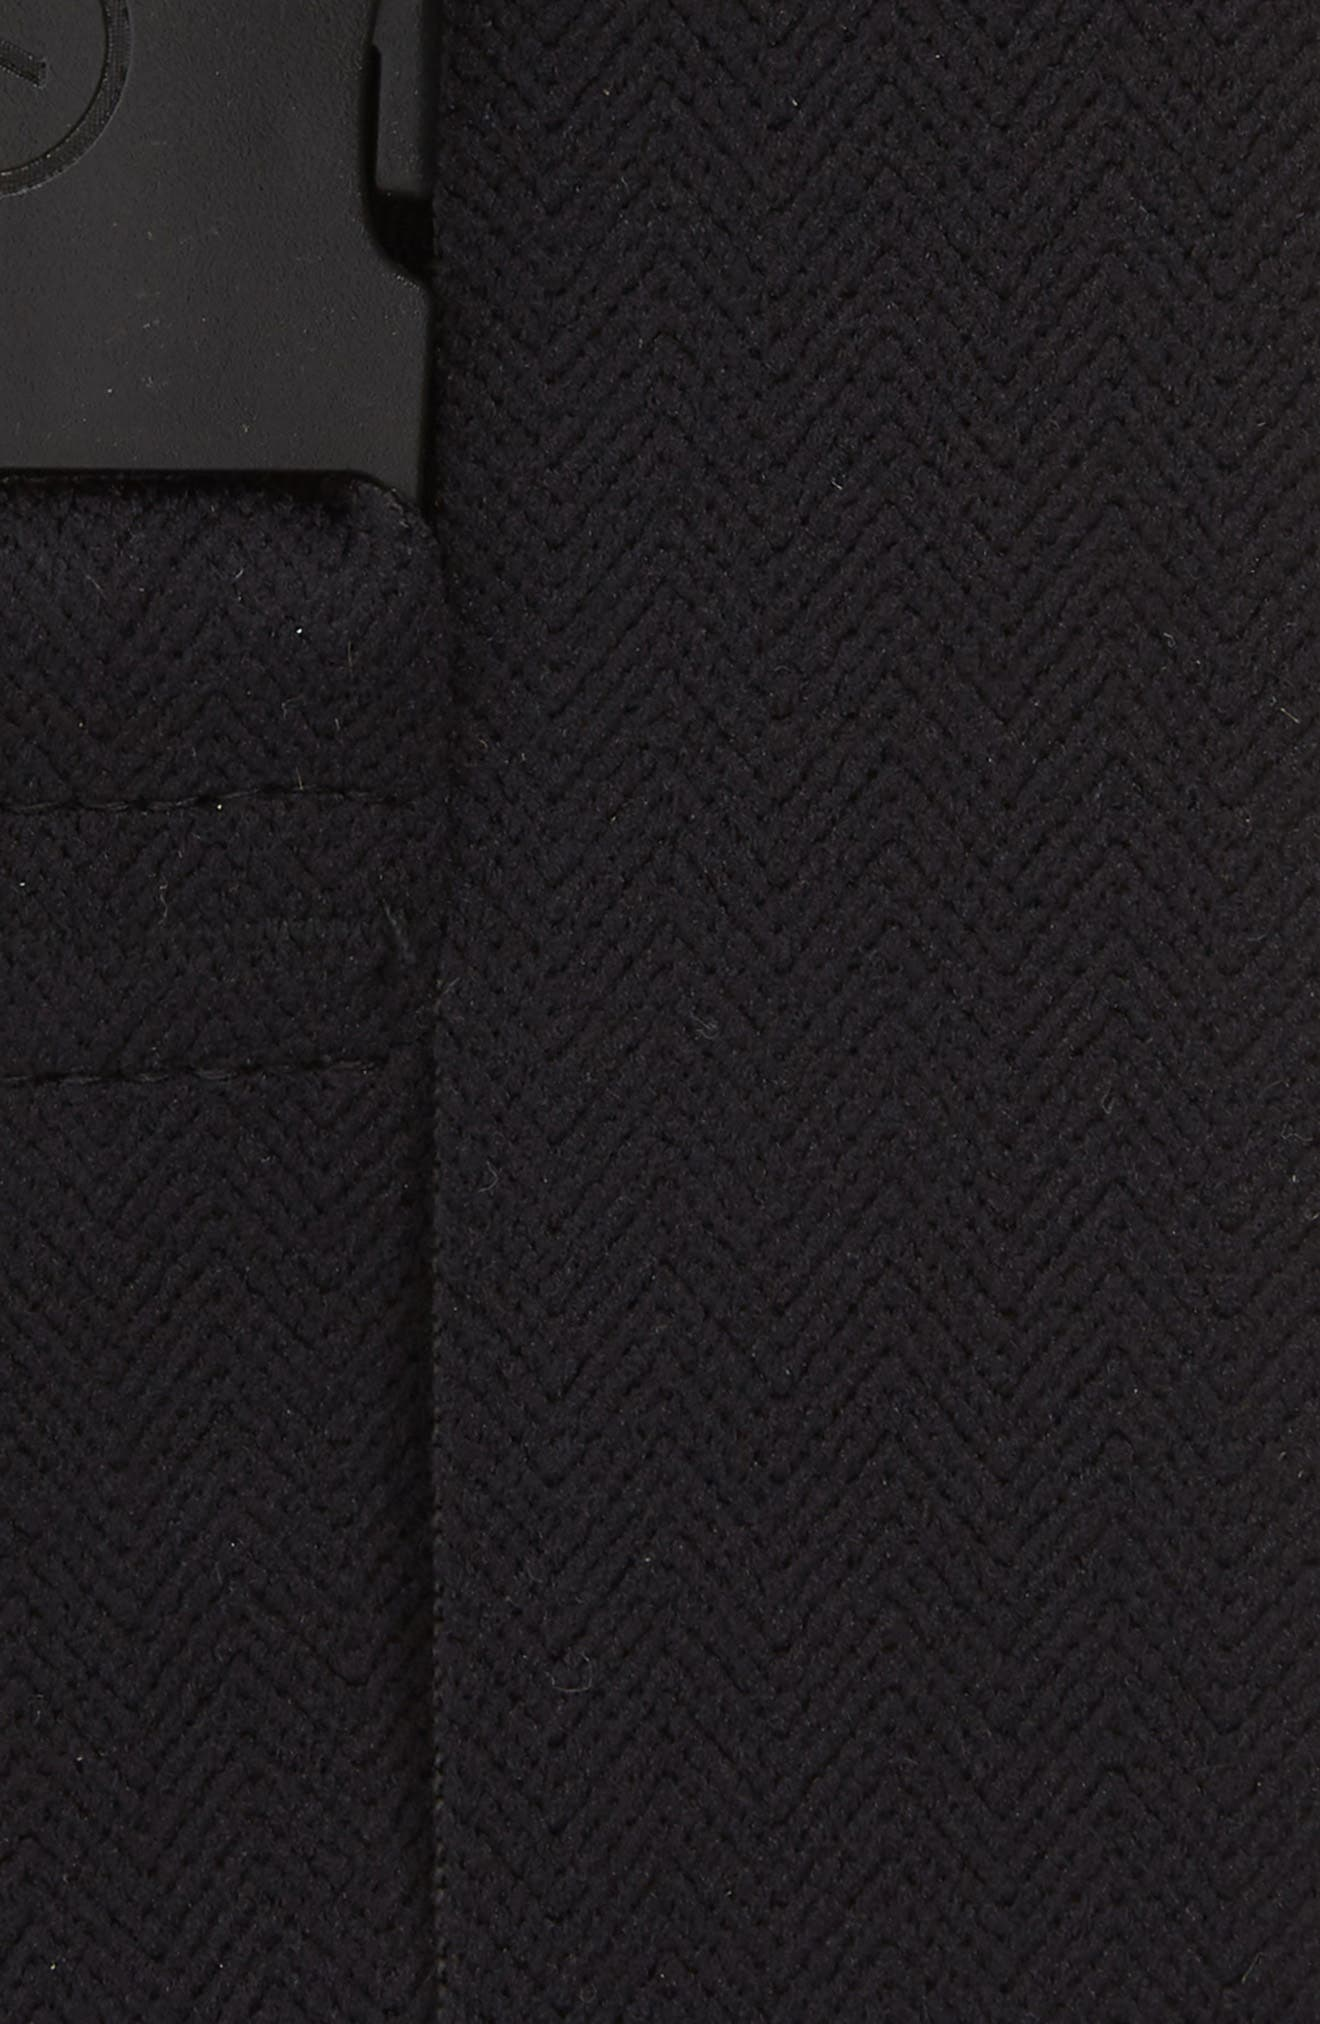 Midnighter Belt,                             Alternate thumbnail 2, color,                             BLACK